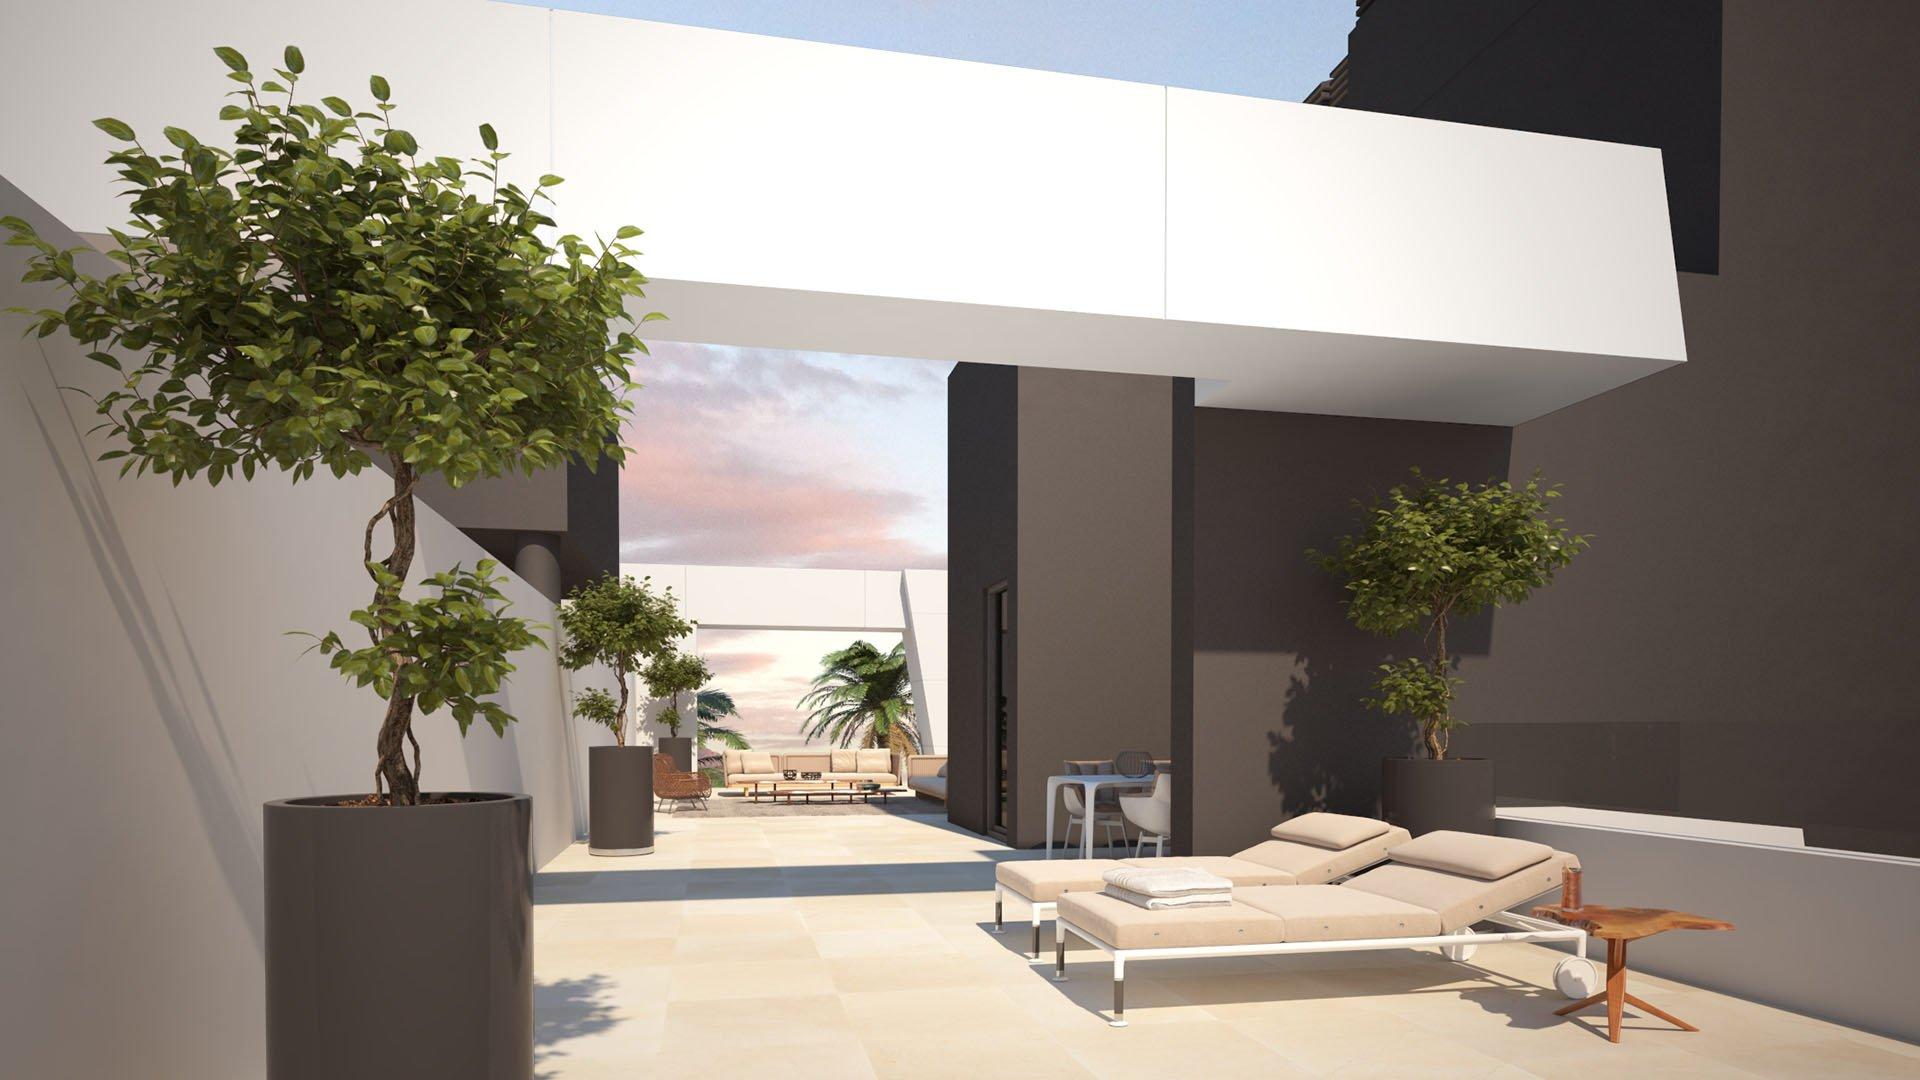 La Montesa : Luxe appartementencomplex nabij Marbella